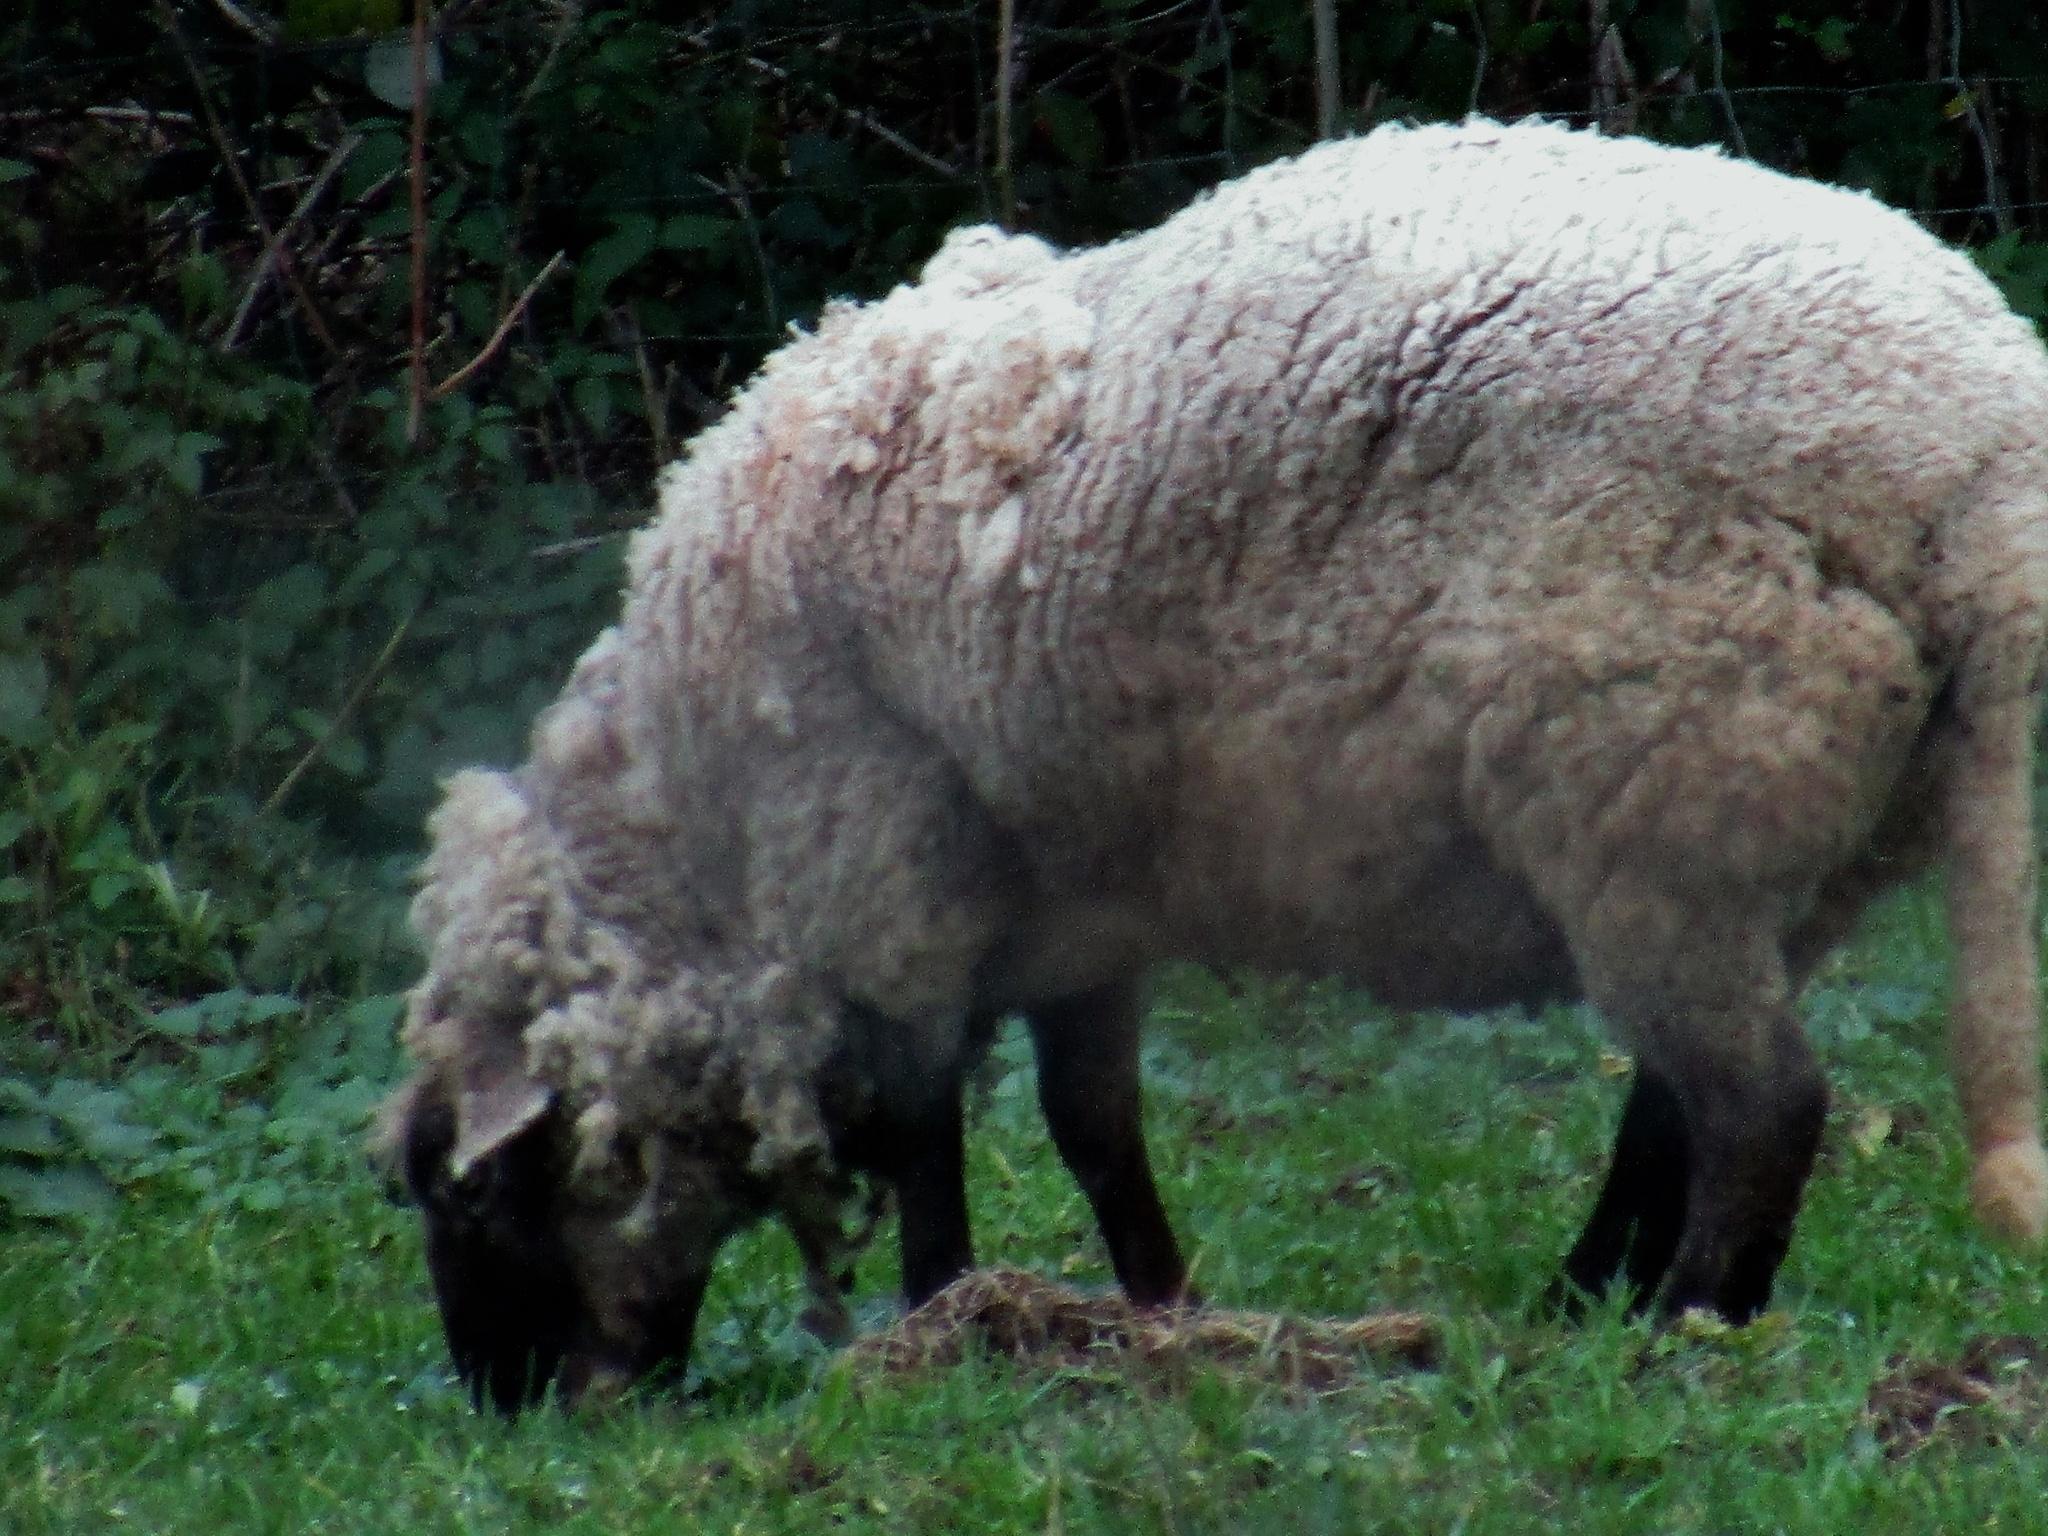 Mouton by catherinevigili